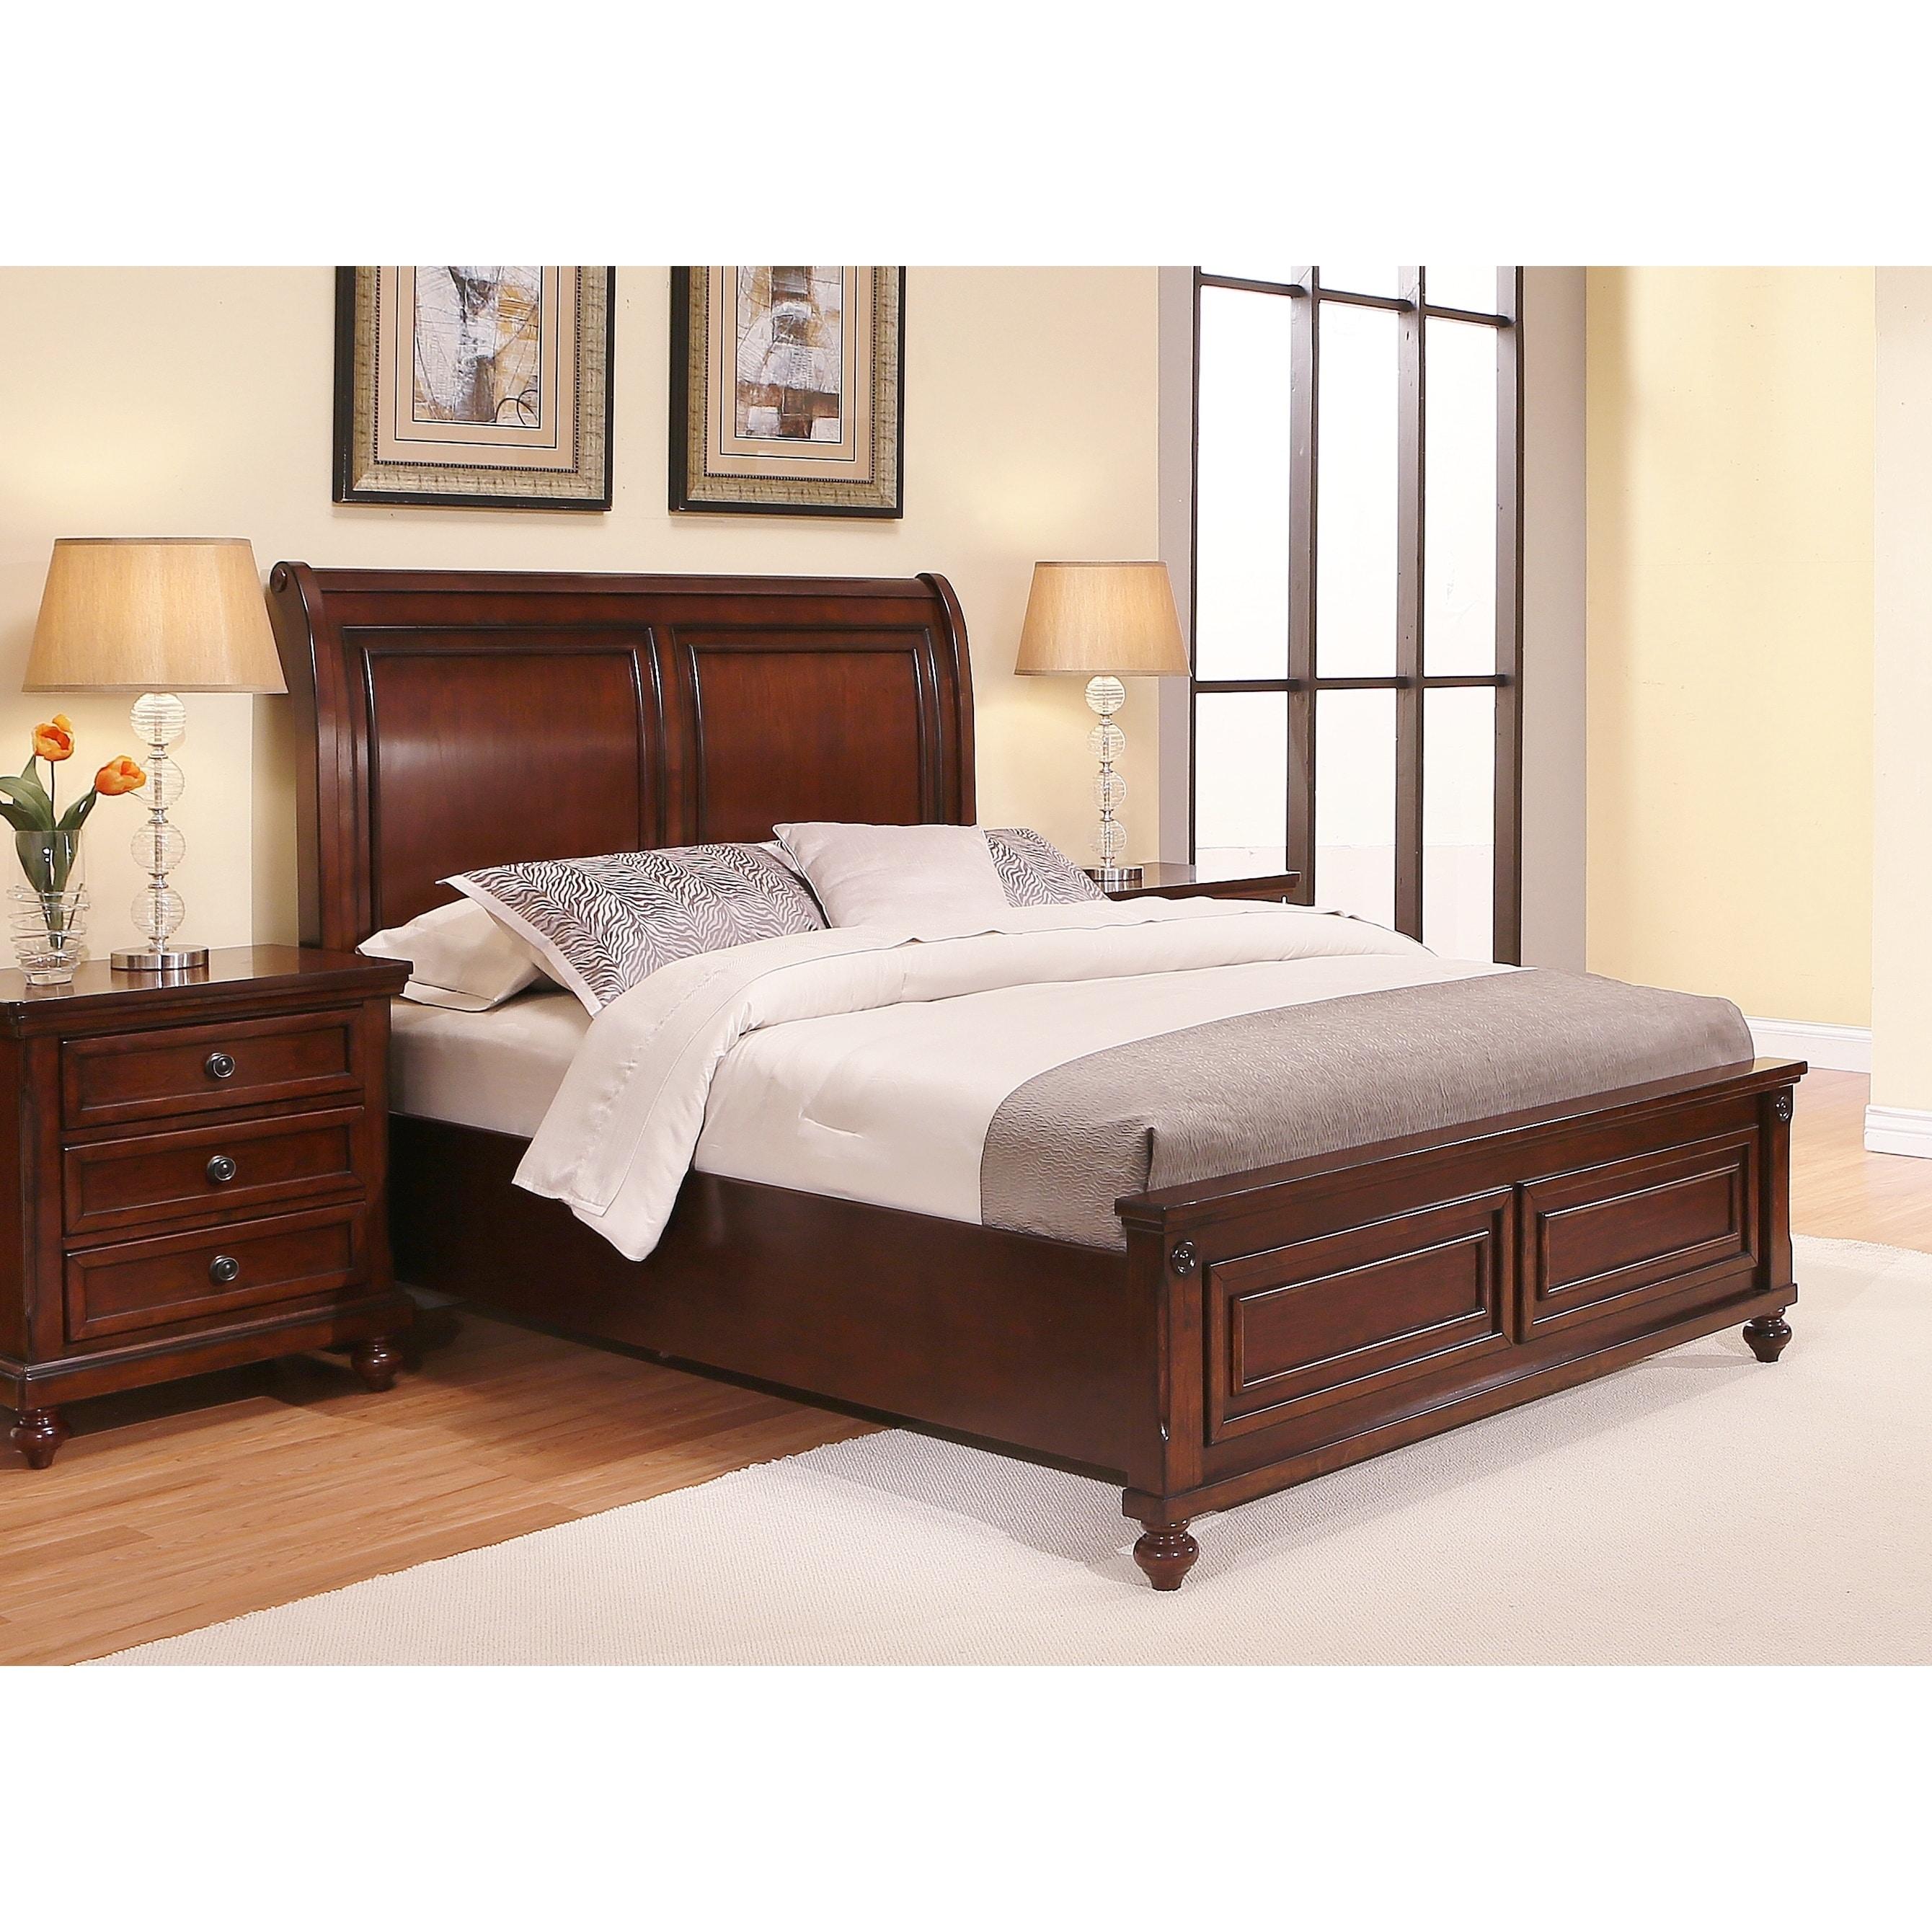 Abbyson Caprice Cherry Wood Bedroom Set (5 piece) - Free Shipping ...